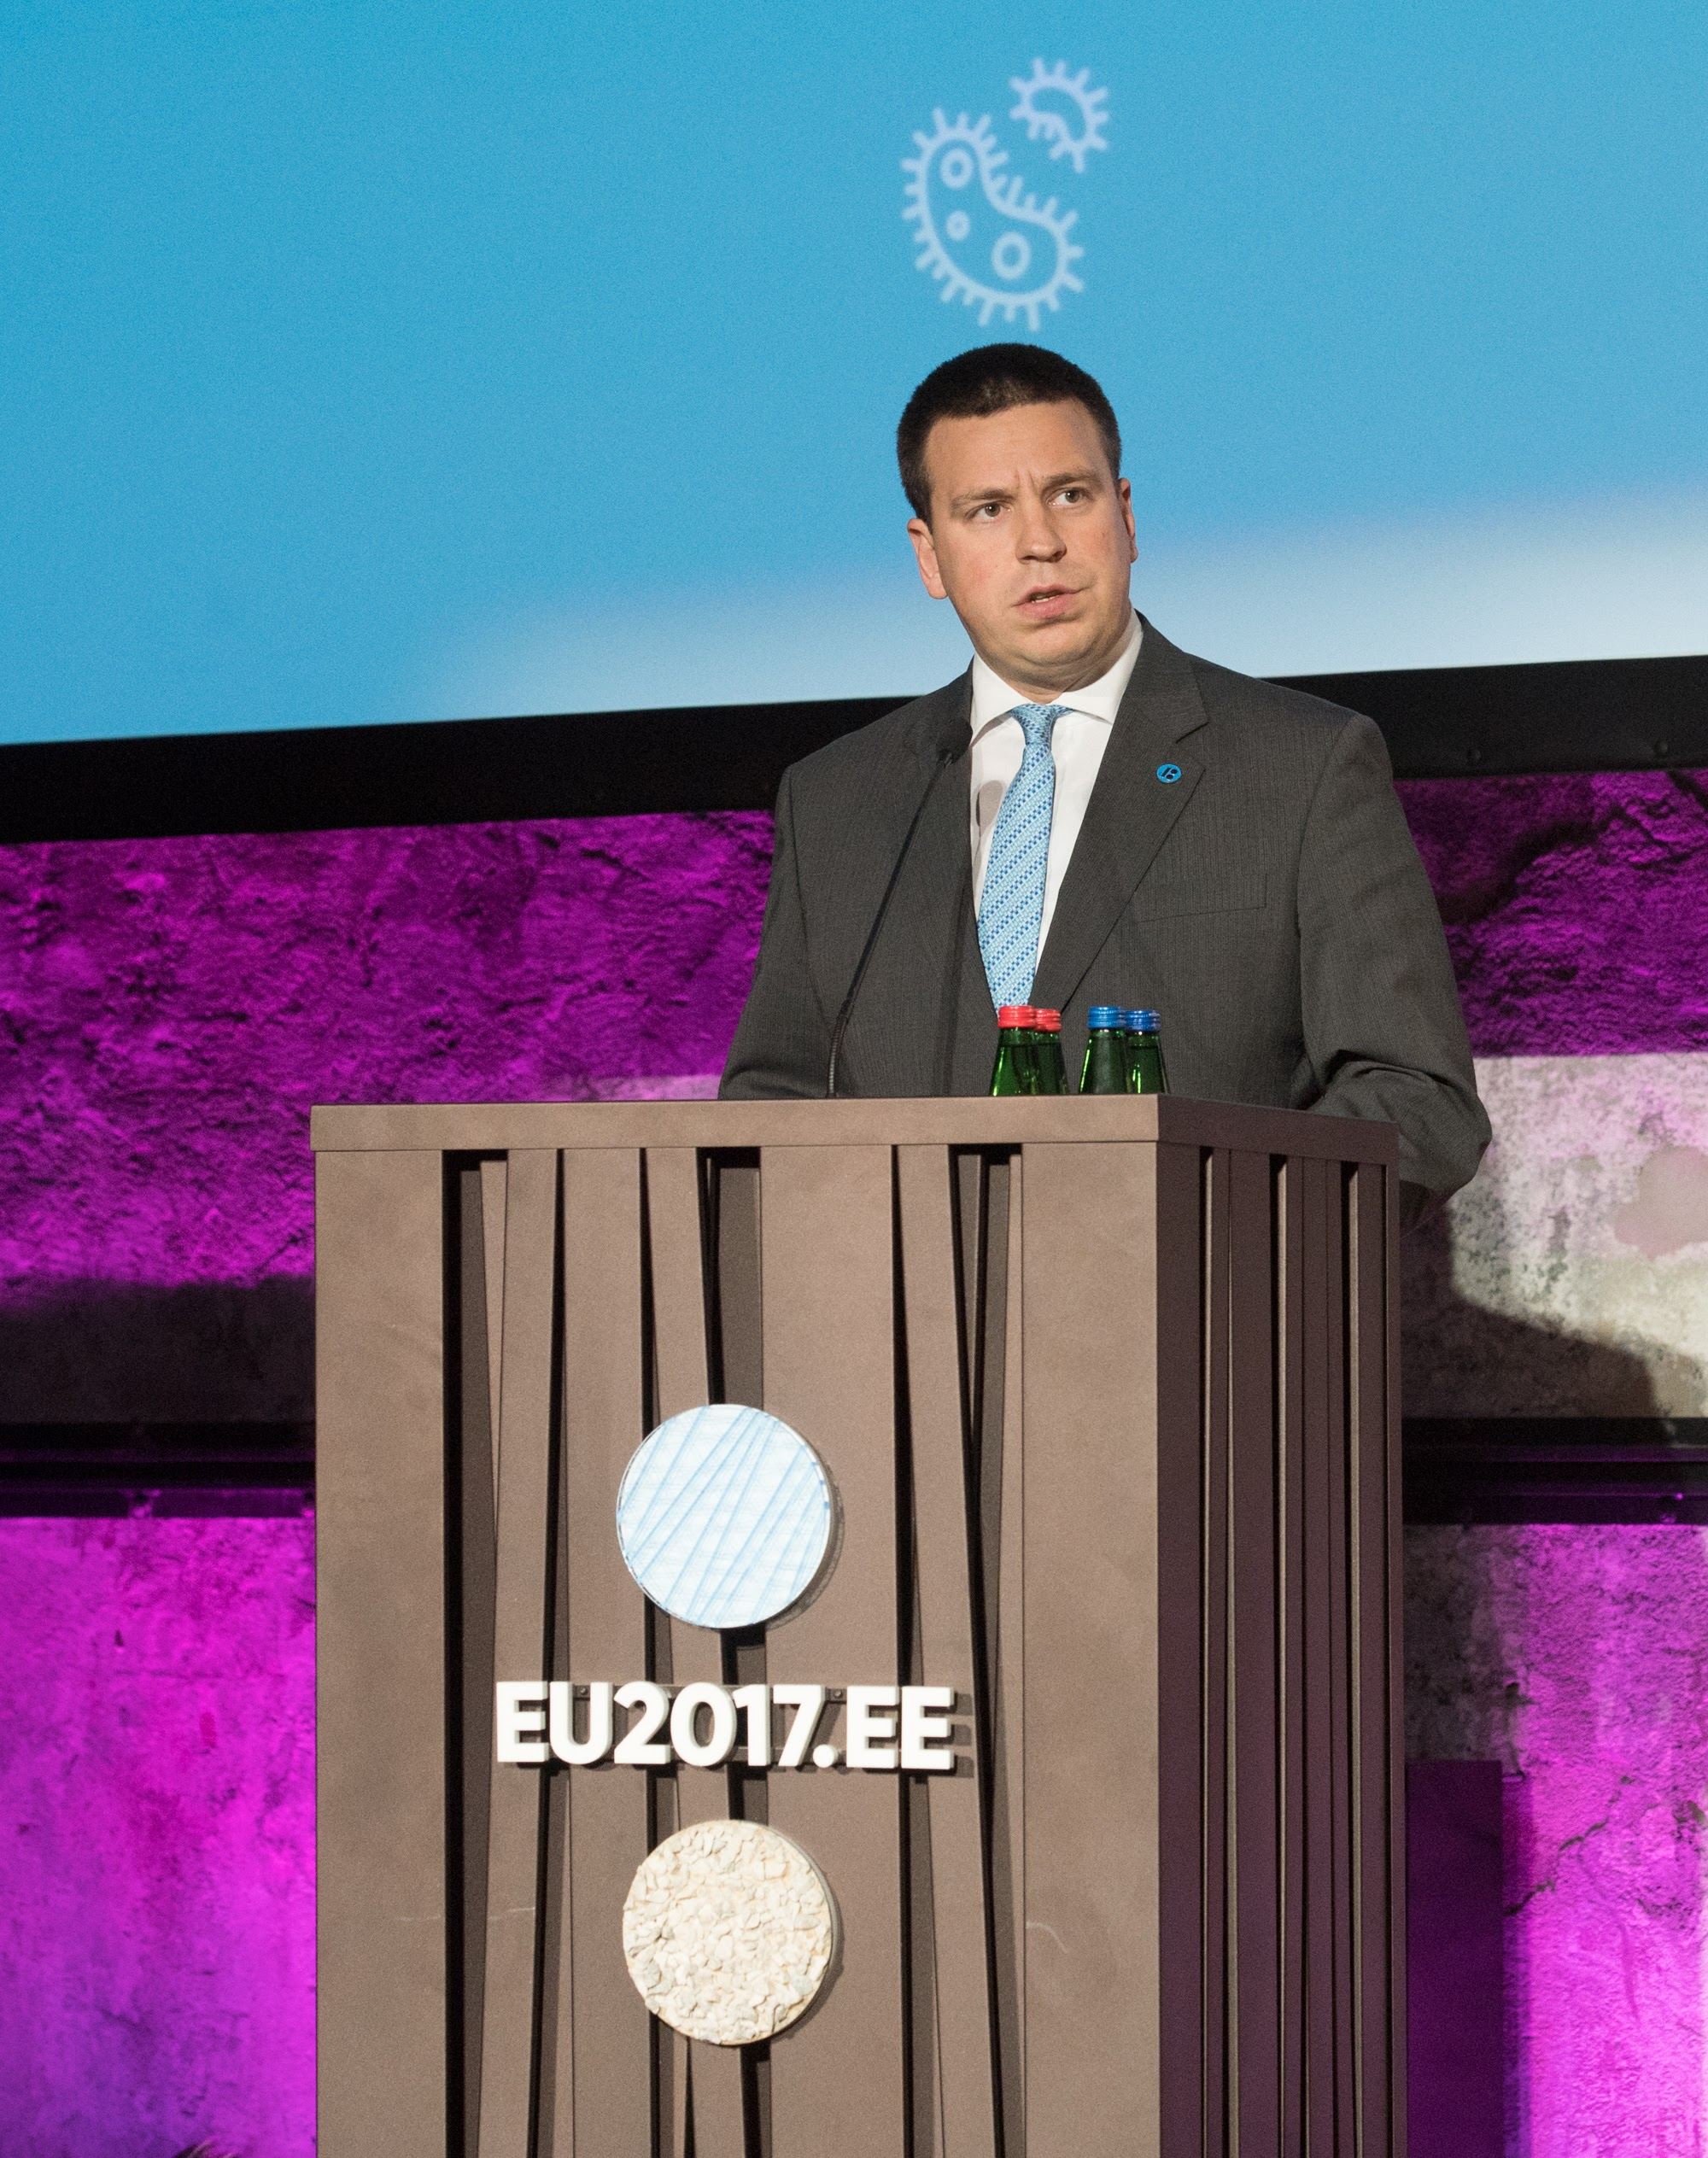 Prime Minister of Estonia, Jüri Ratas